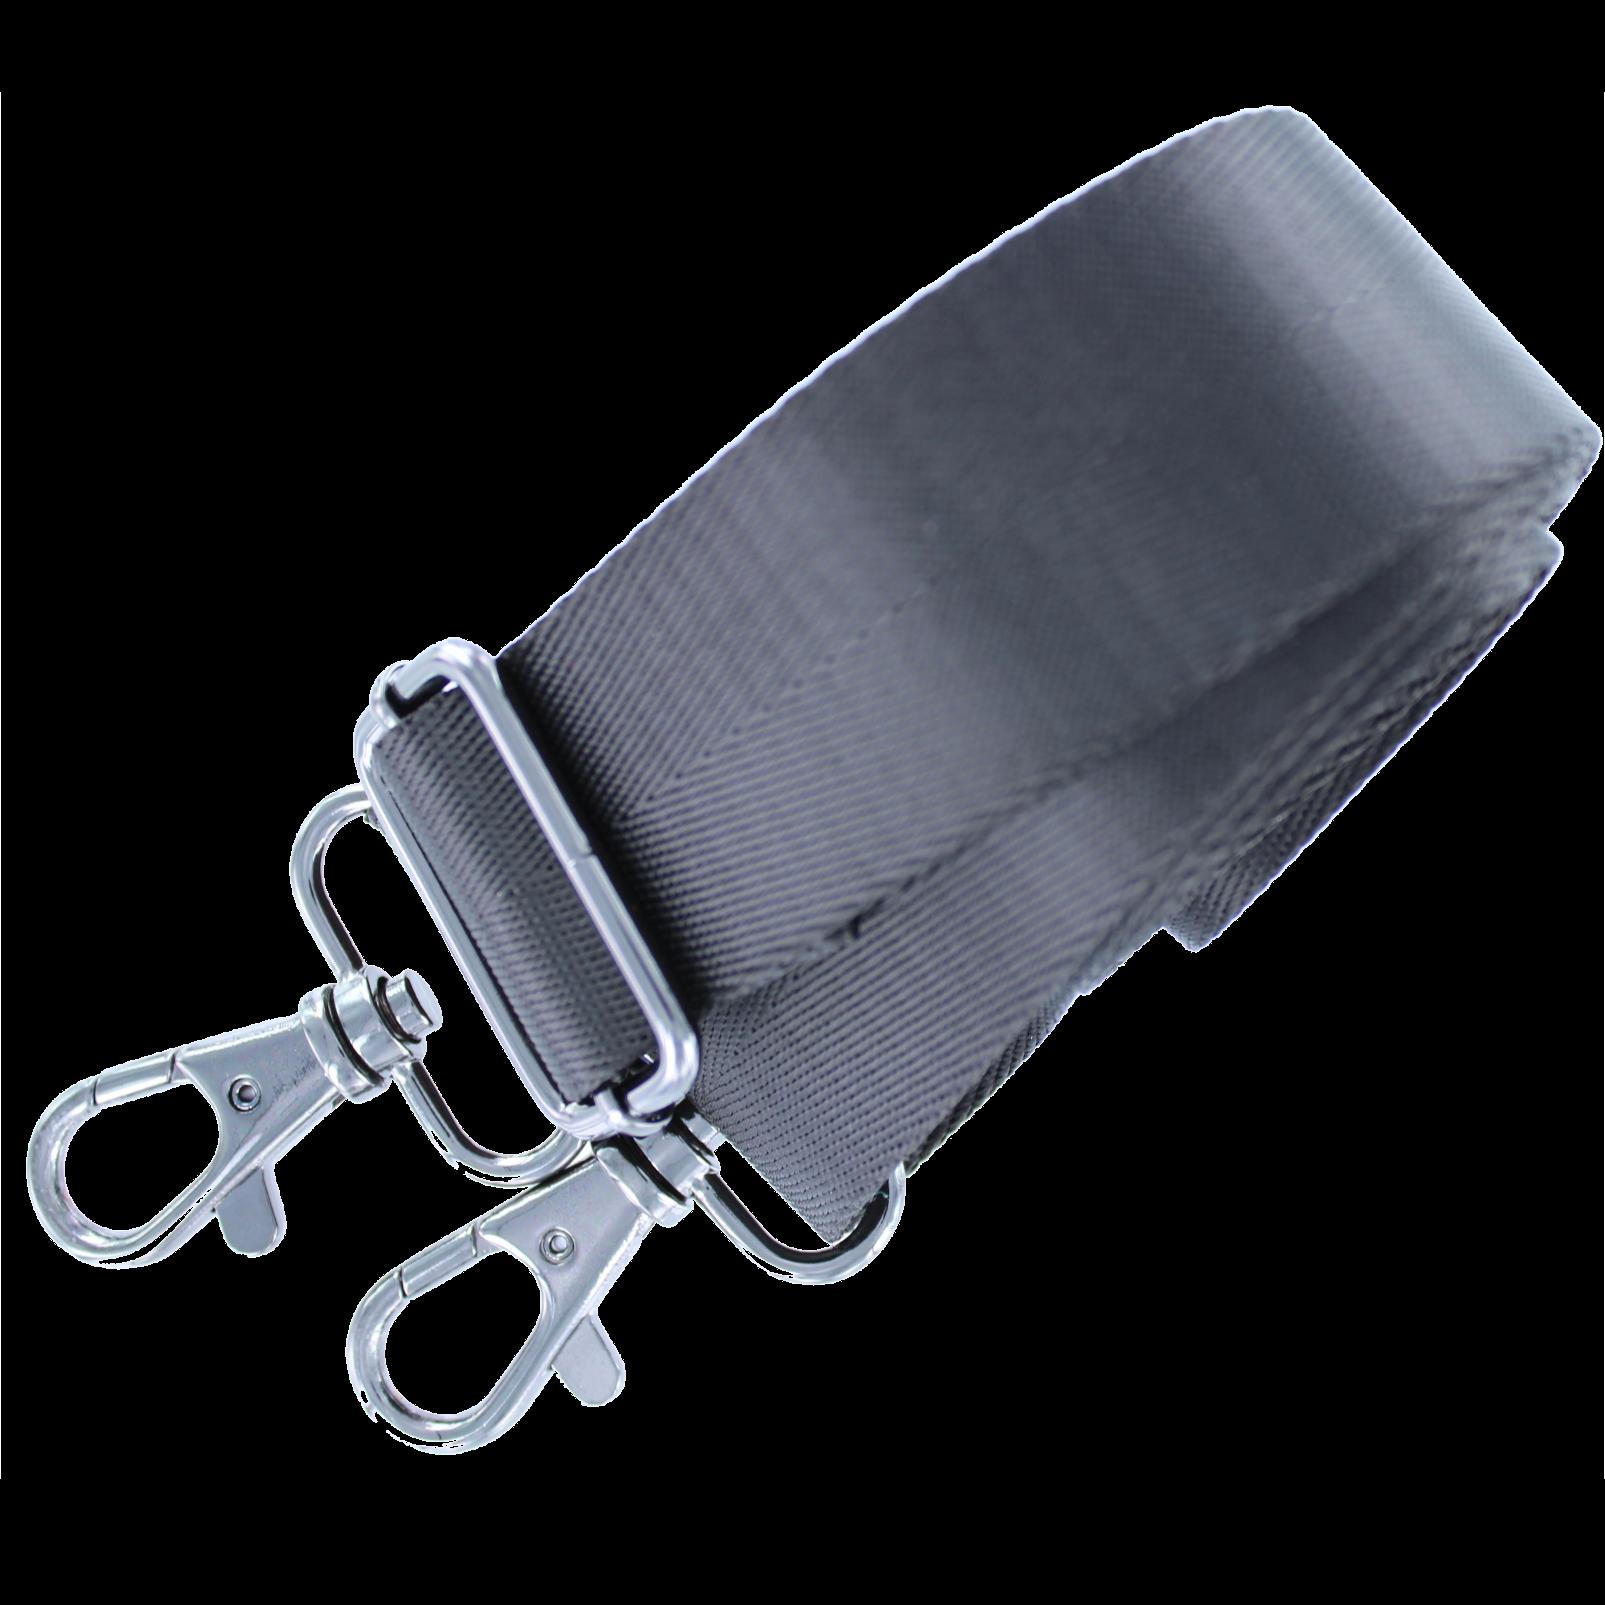 Carrying strap, JBL Xtreme